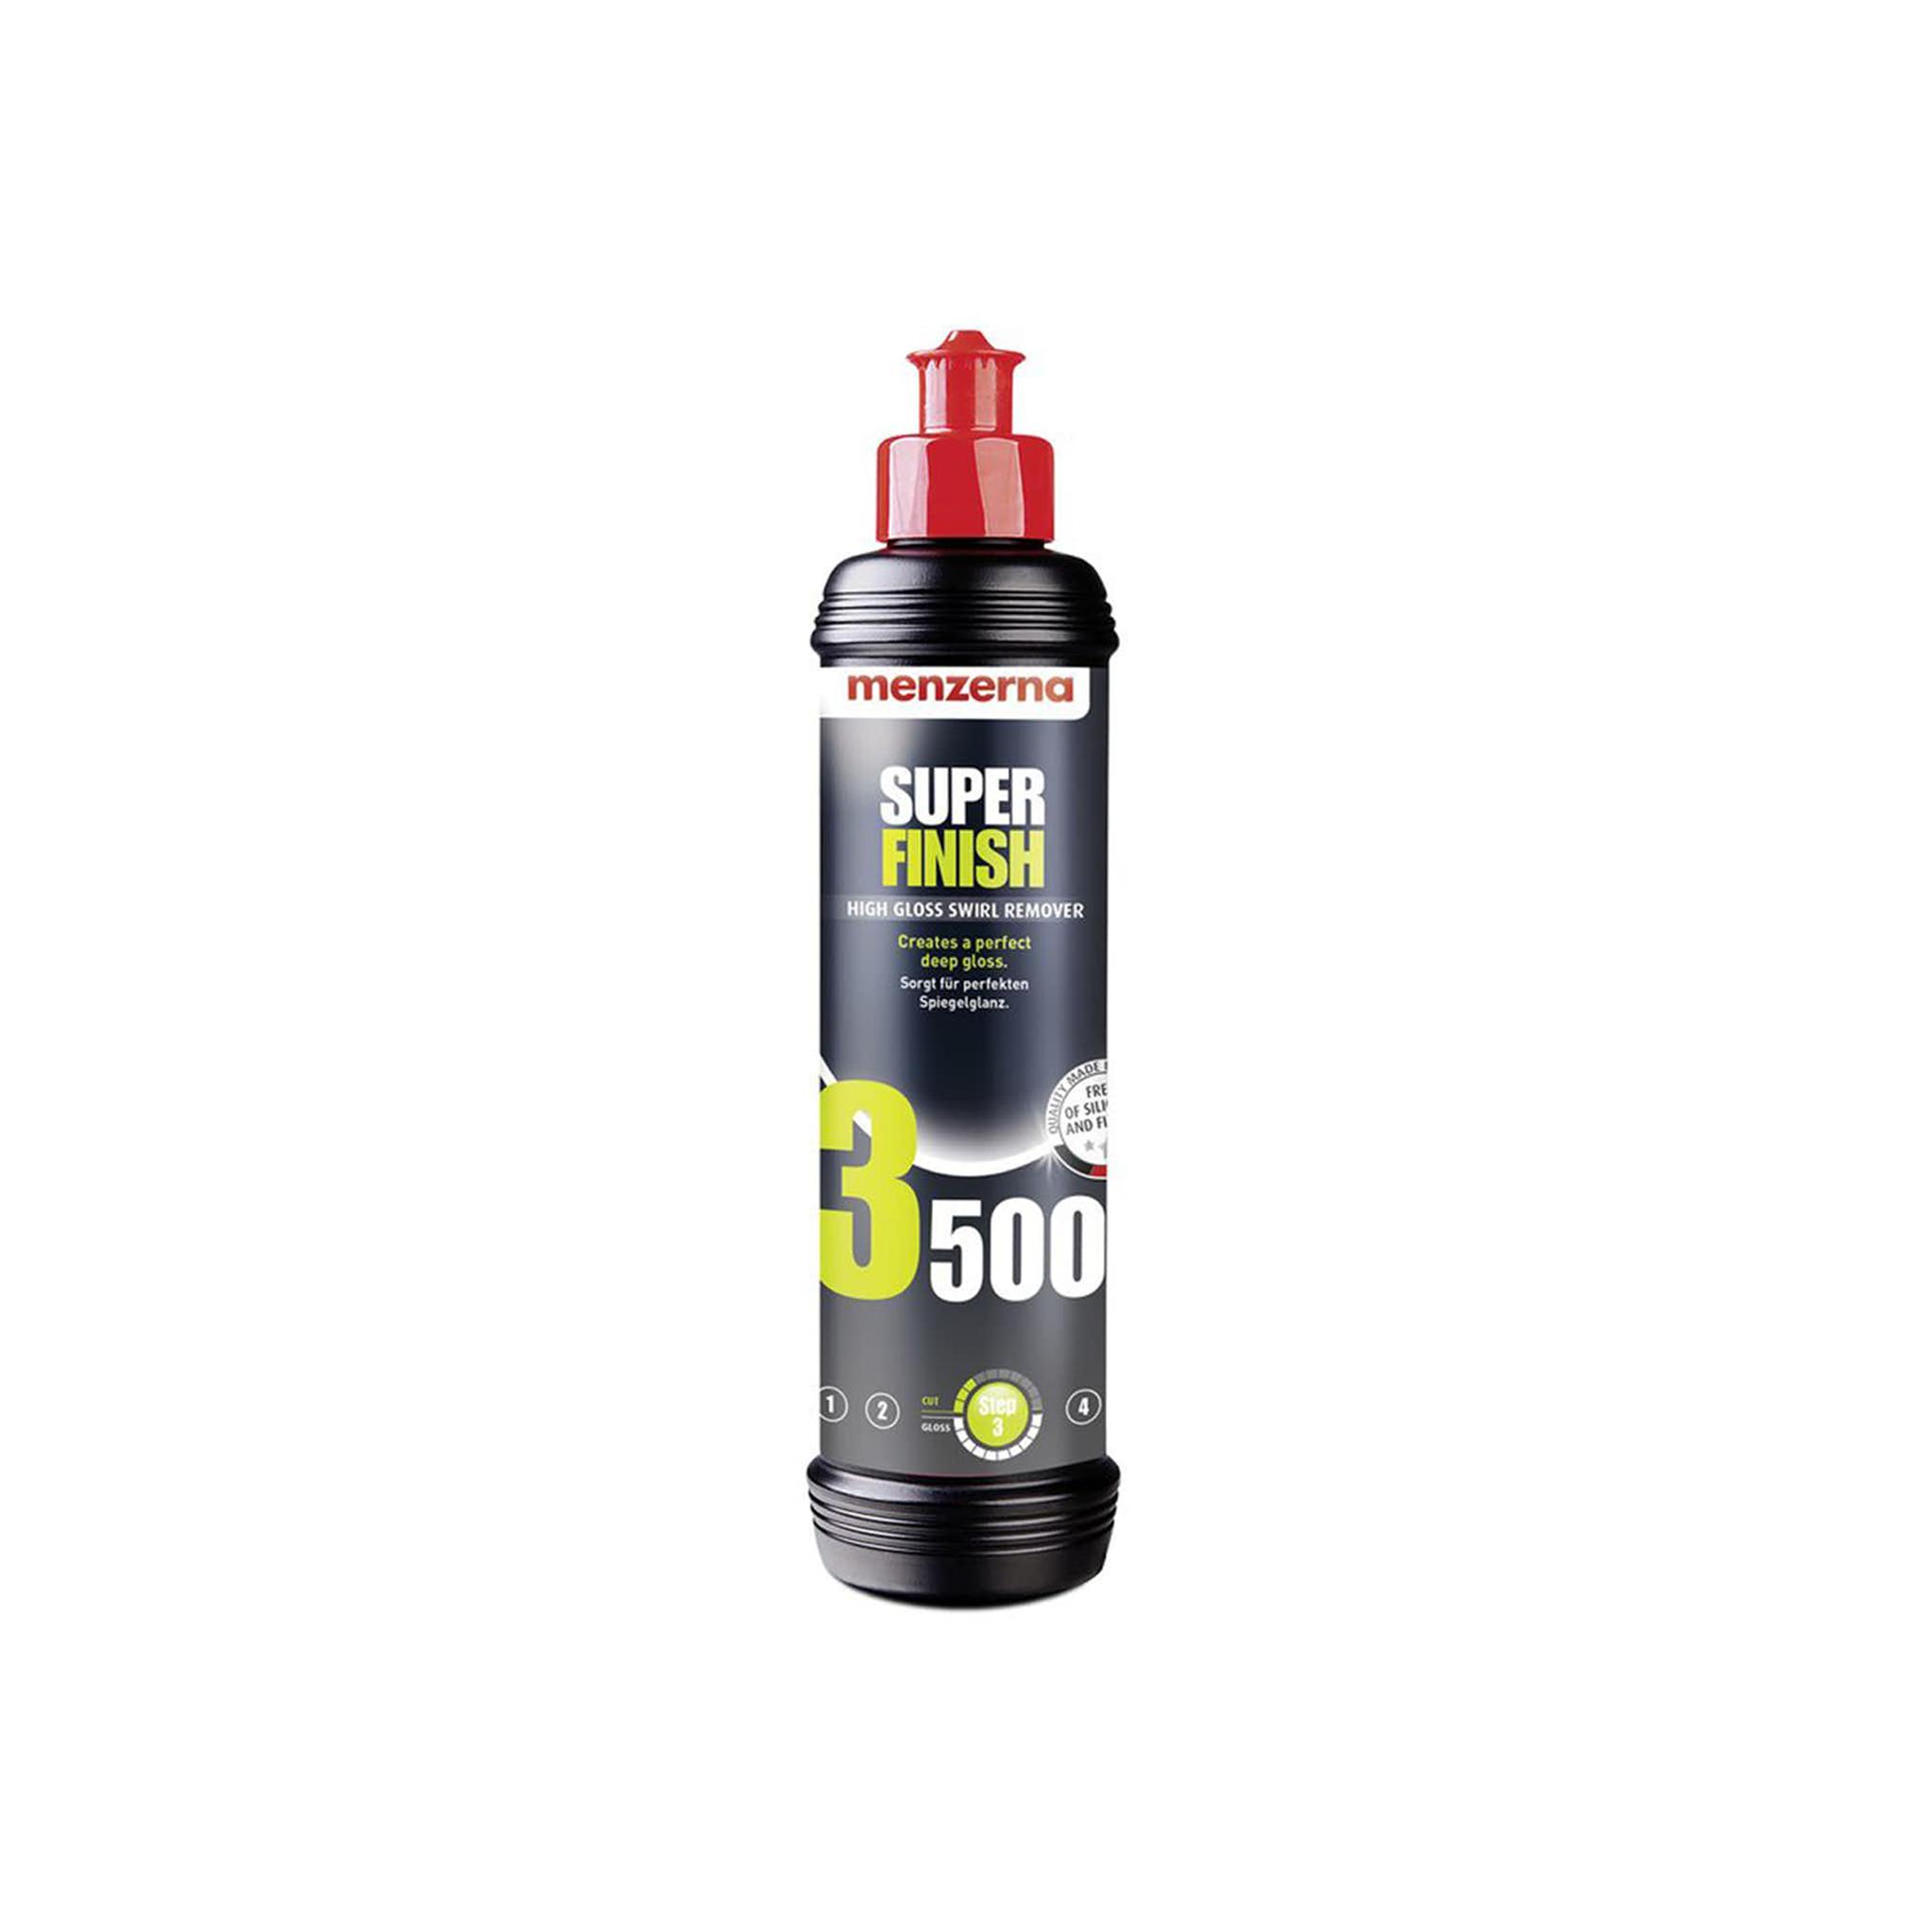 Polermedel Menzerna Super Finish 3500, Finishing, 250 ml